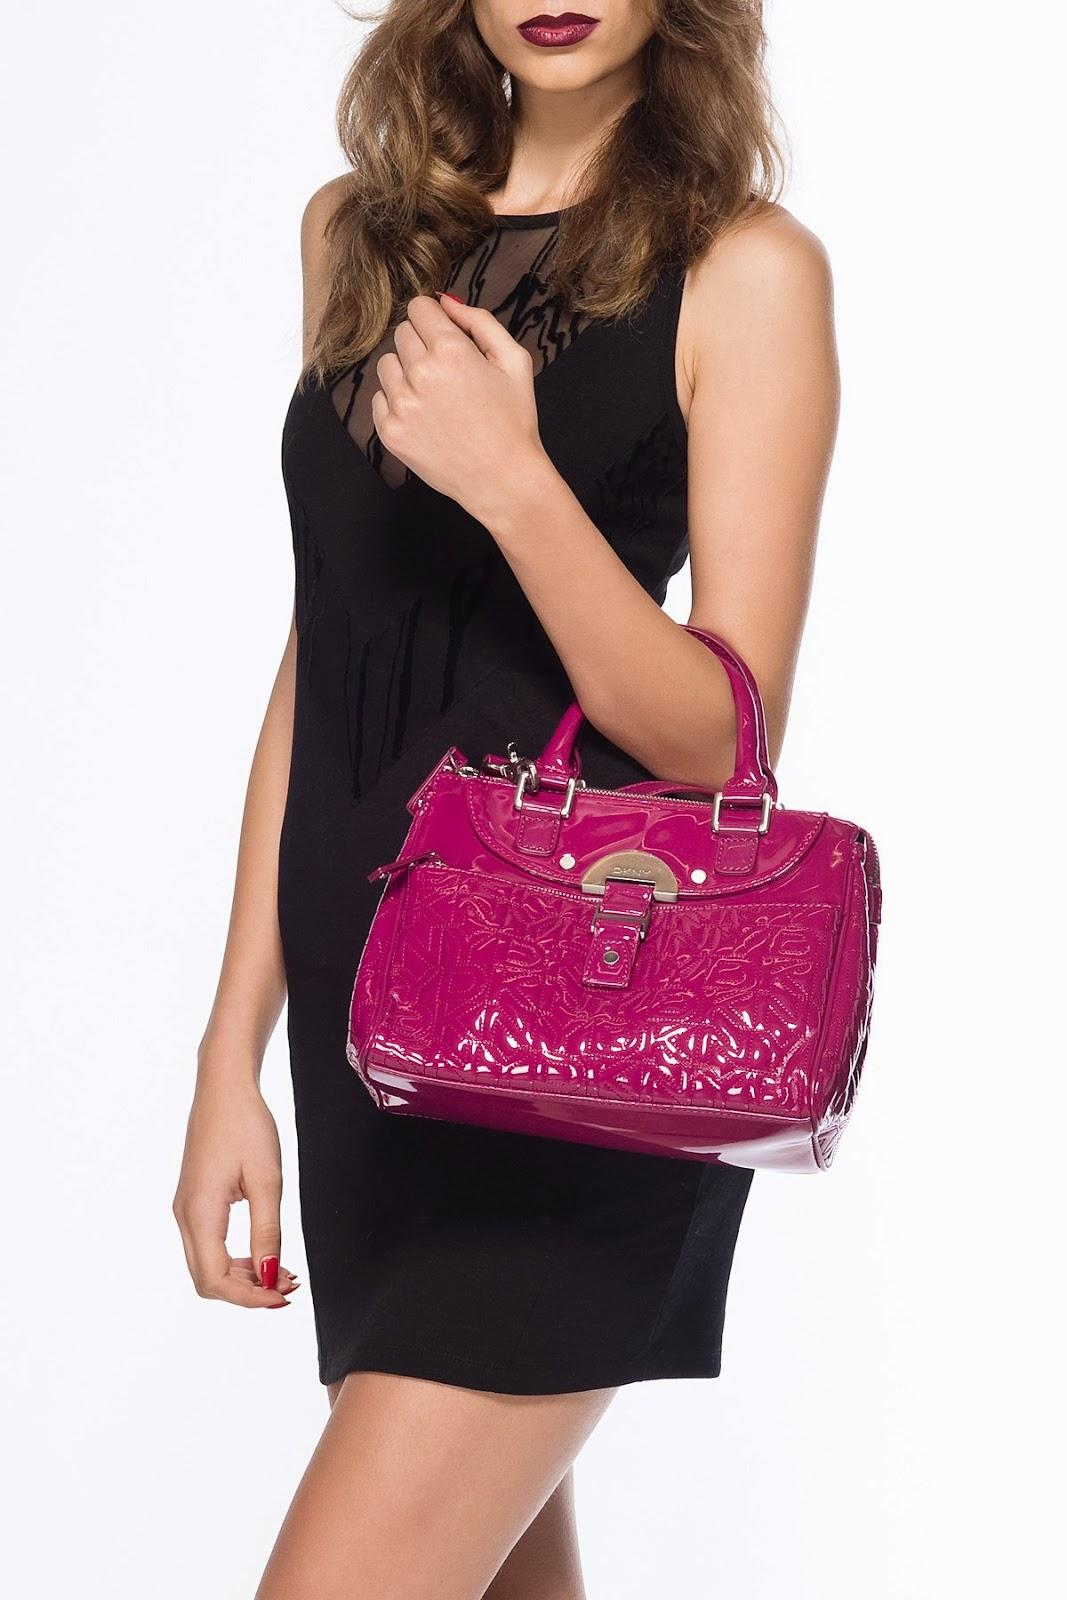 sembrono: DKNY ladies bag models, models 2014 summer